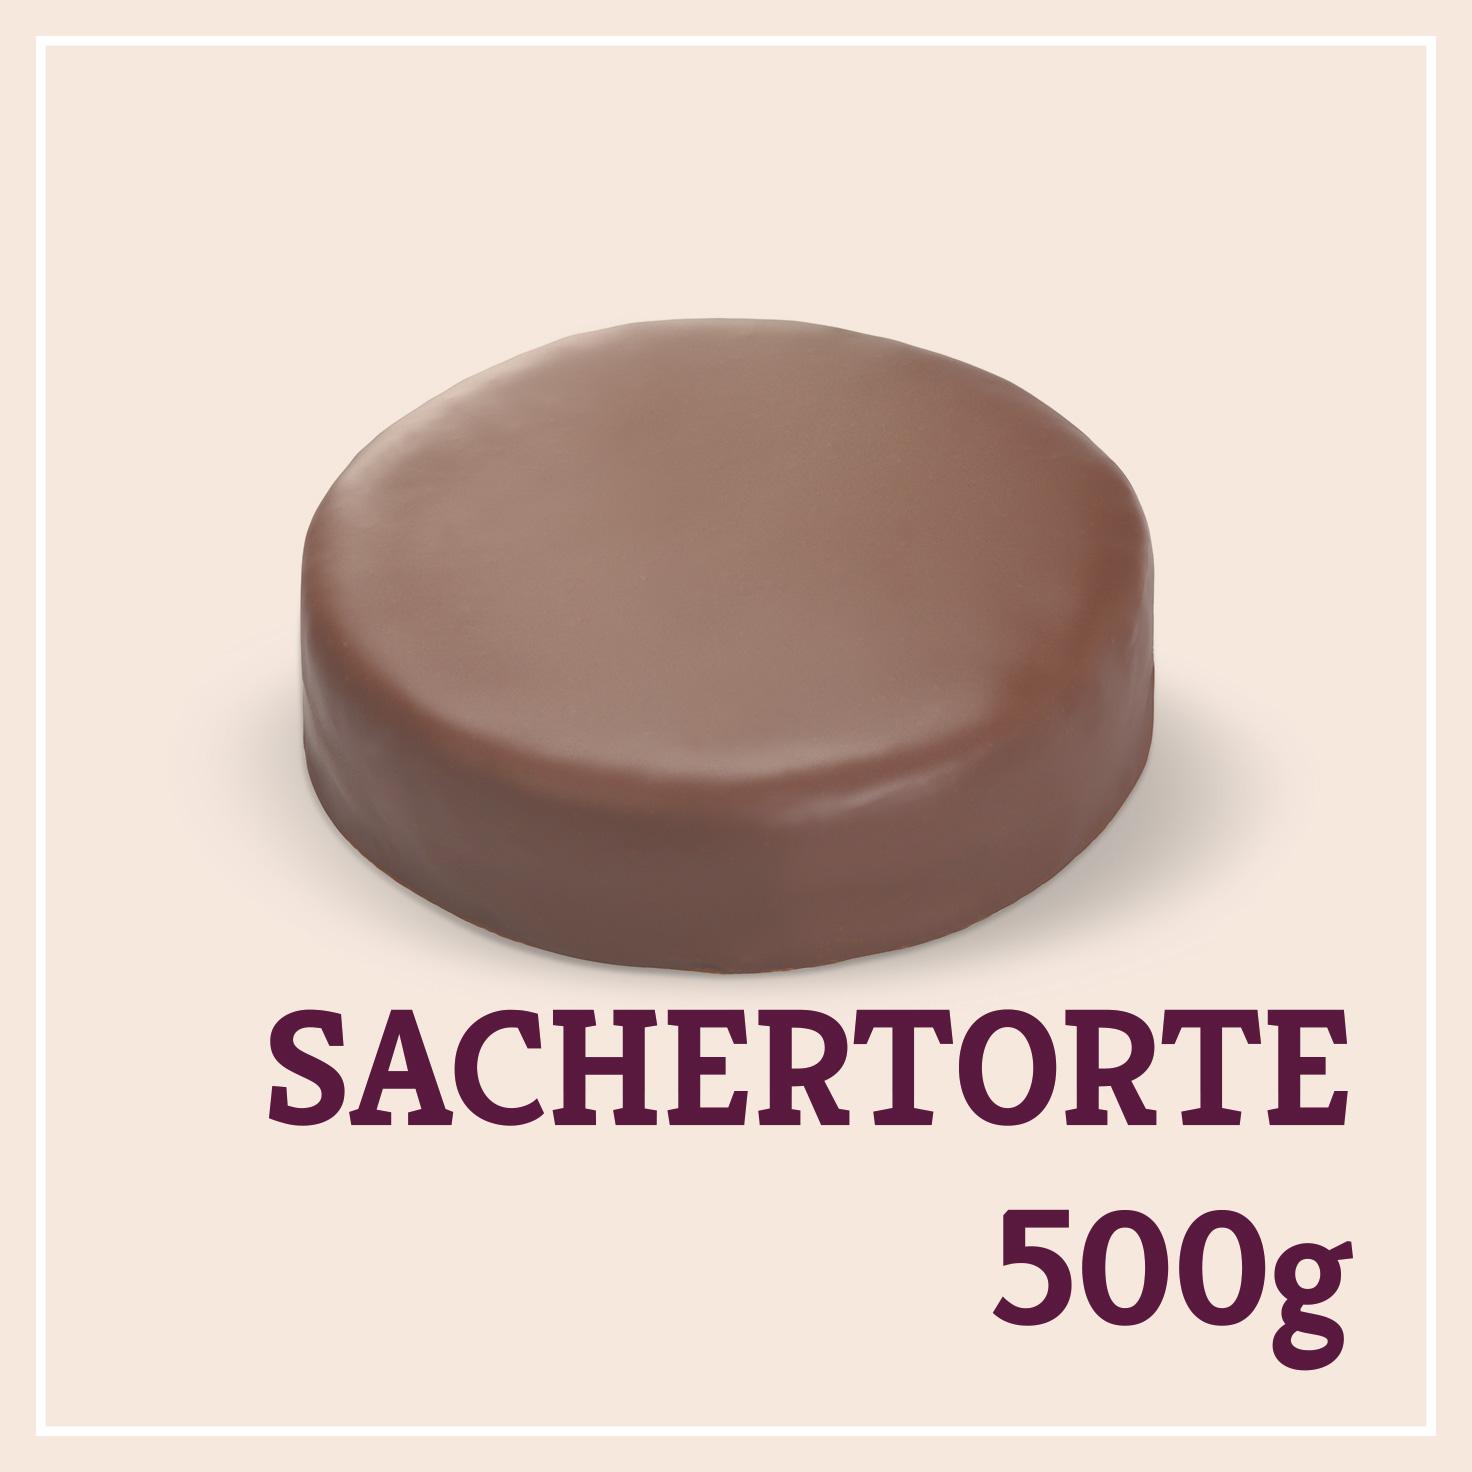 Heiss & Süß - Sachertorte 500g